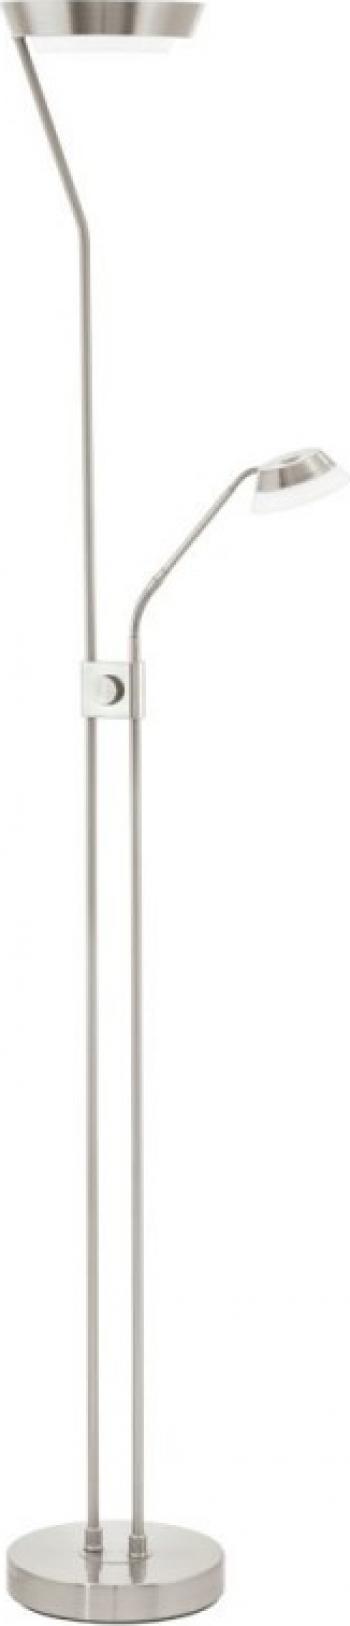 Lampadar EGLO Sarrione 93713 LED 17 28W 2 88W 4 5W Nichel satinat Corpuri de iluminat